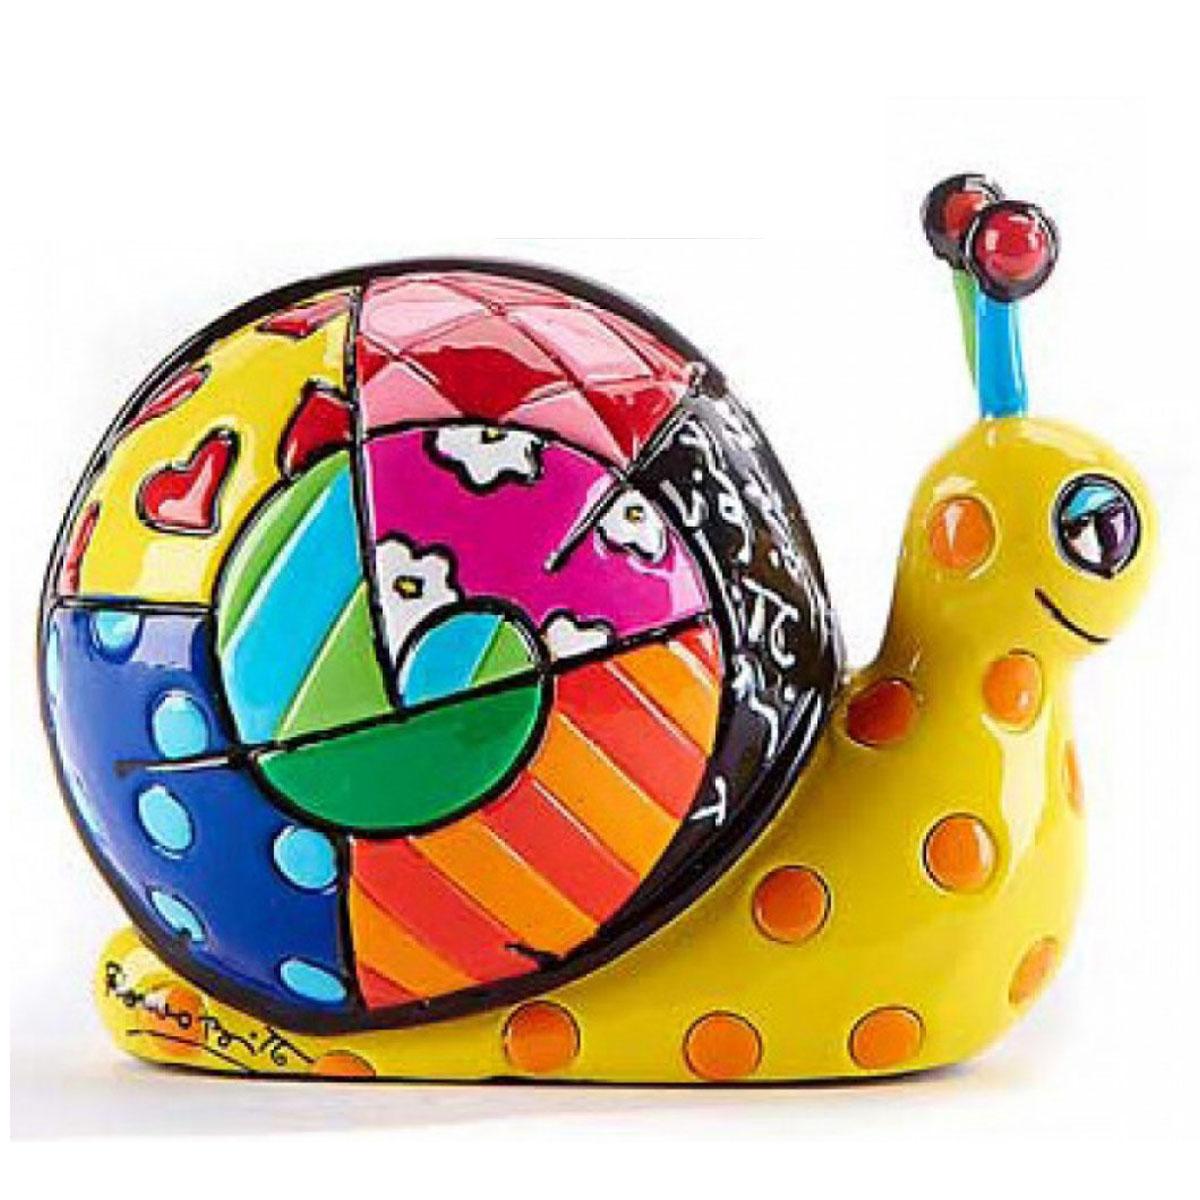 Figurine créateur \'Britto\' multicolore (escargot) - 65 mm - [A2828]